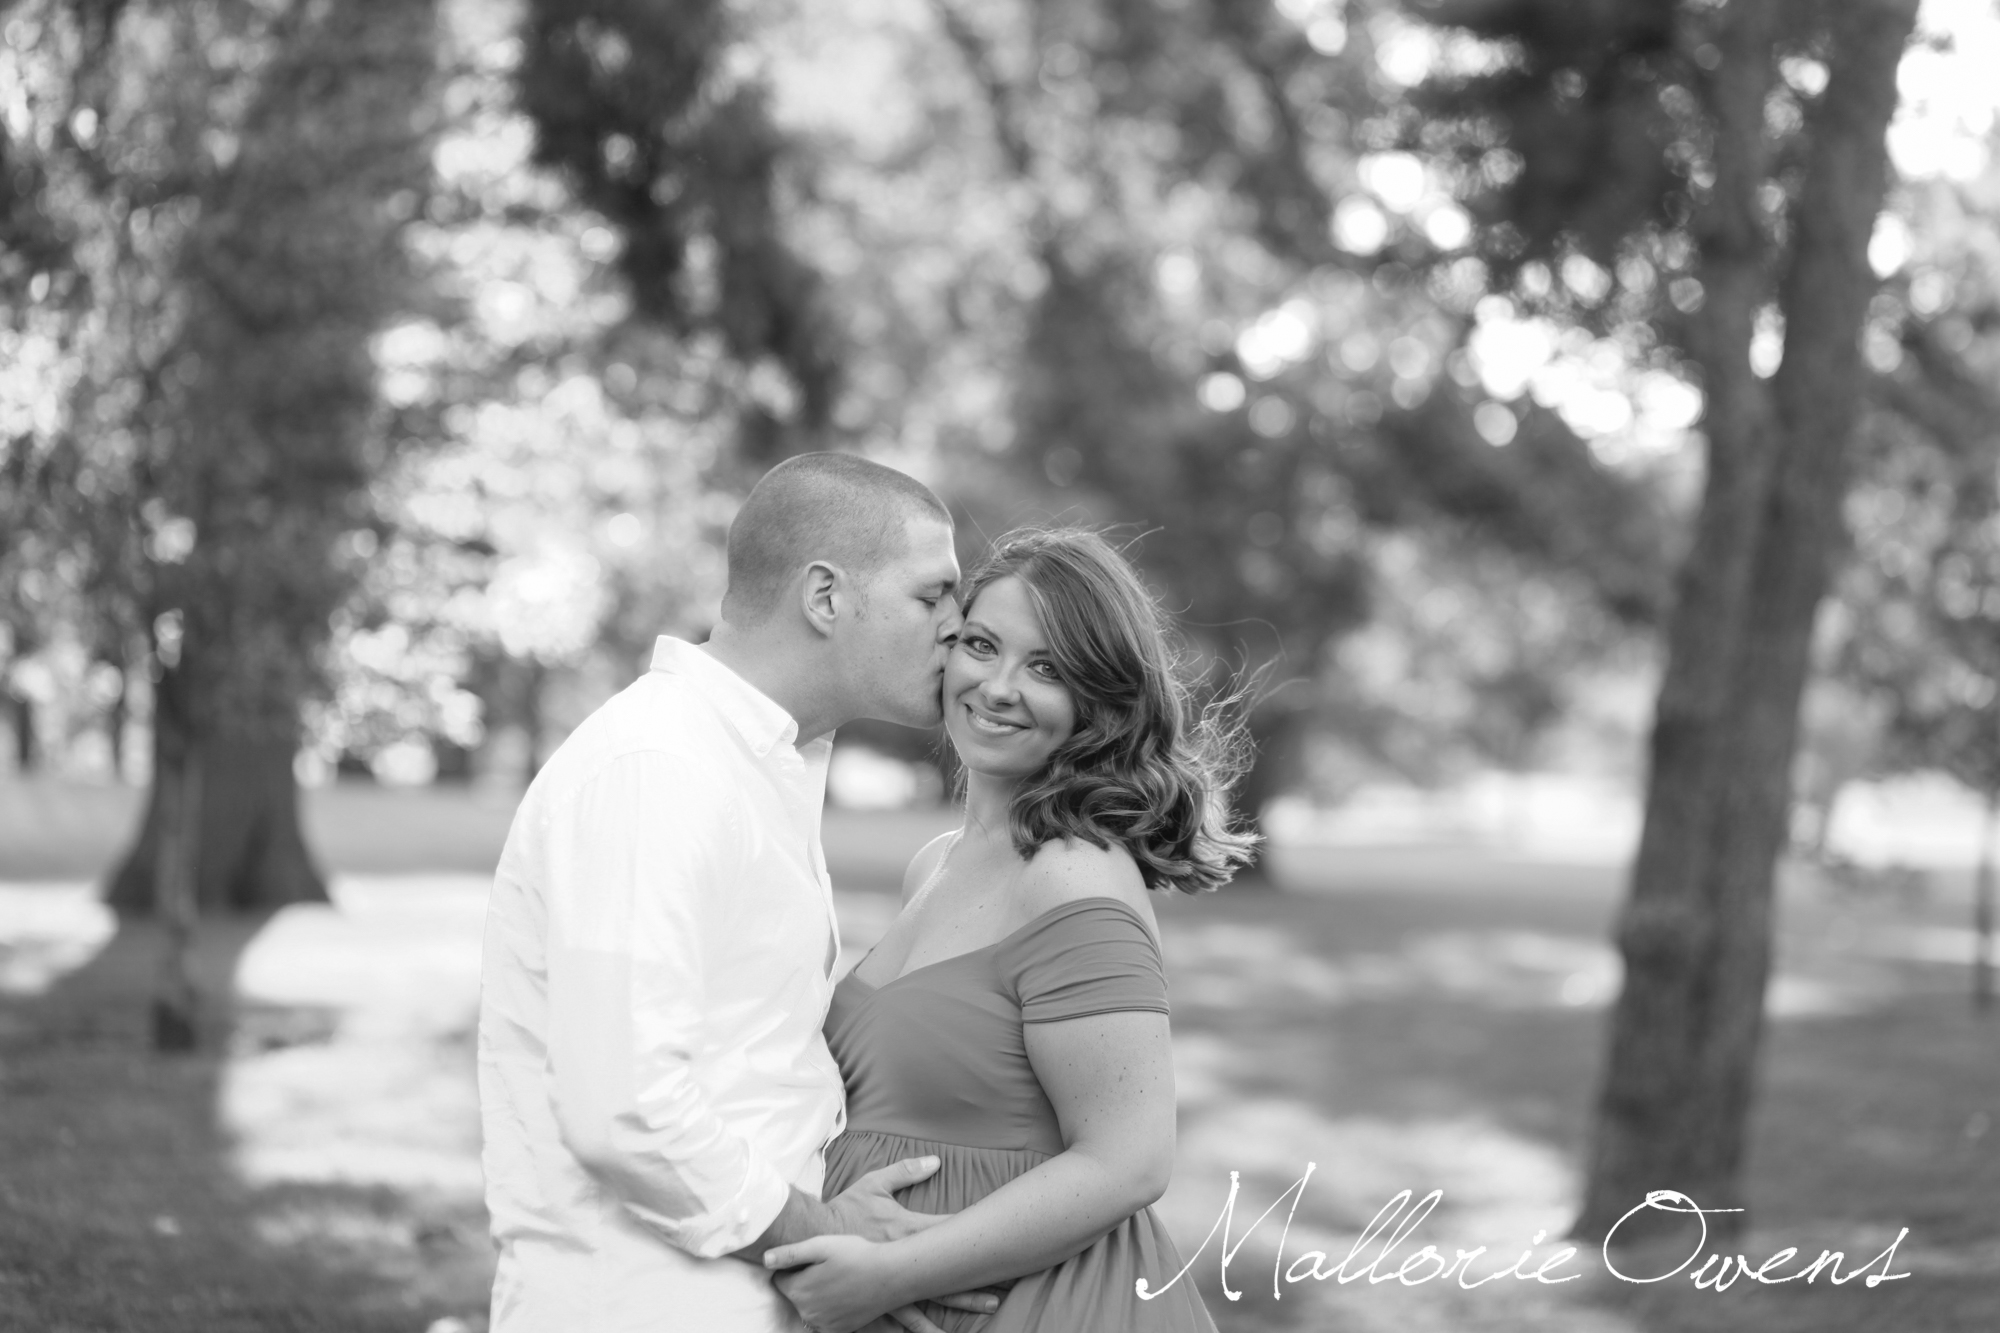 Kansas City Maternity Photographer | Mallorie Owens